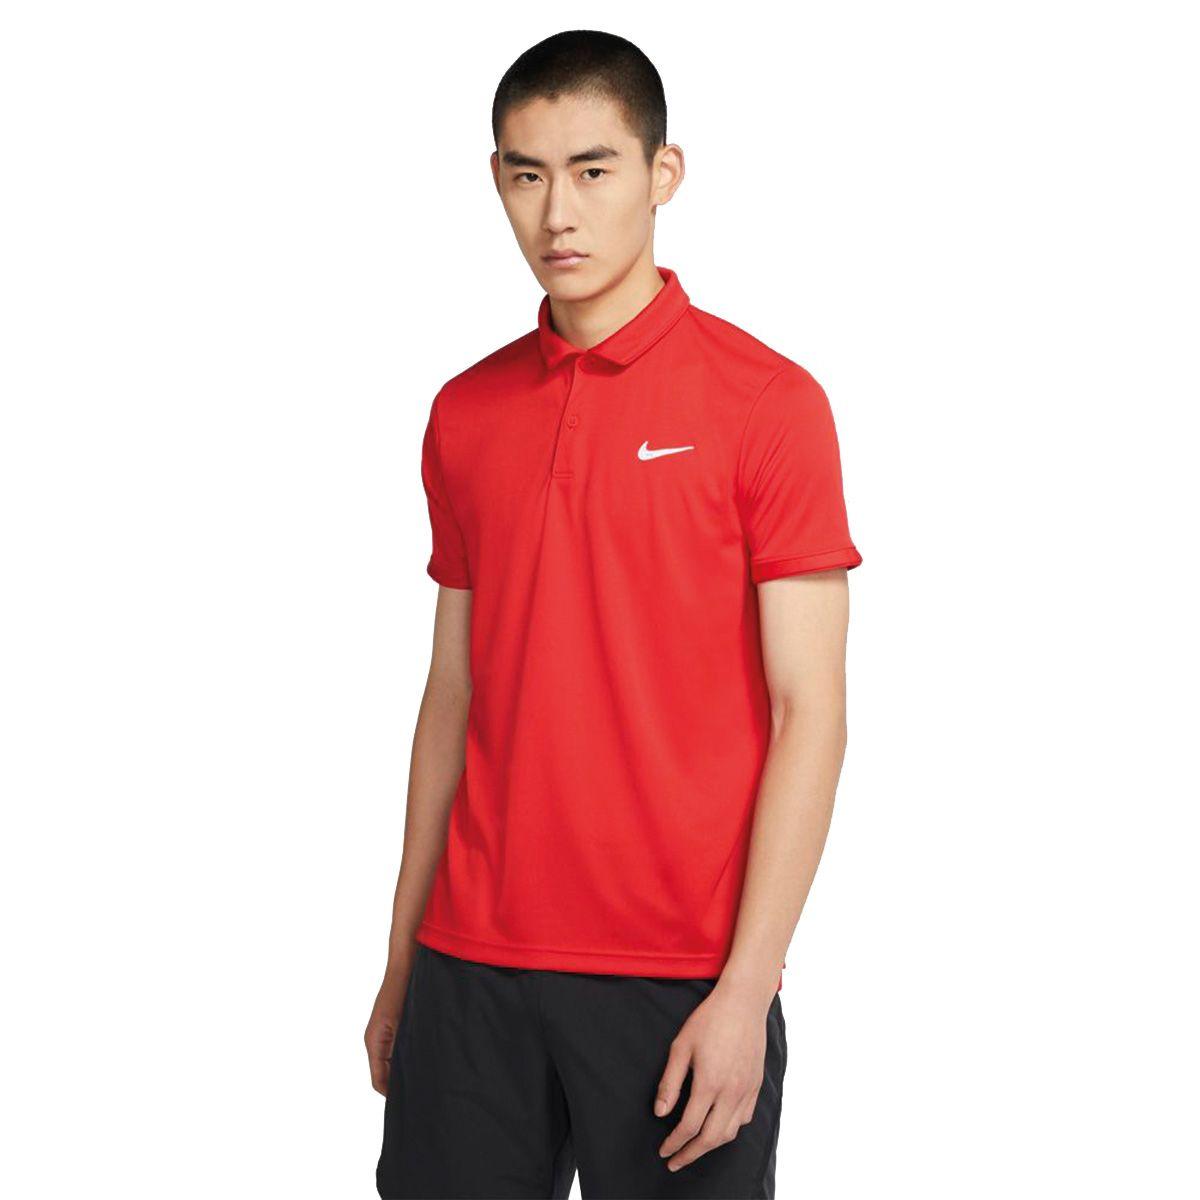 Nike Polo NikeCourt Dri-FIT Victory Uomo Rosso